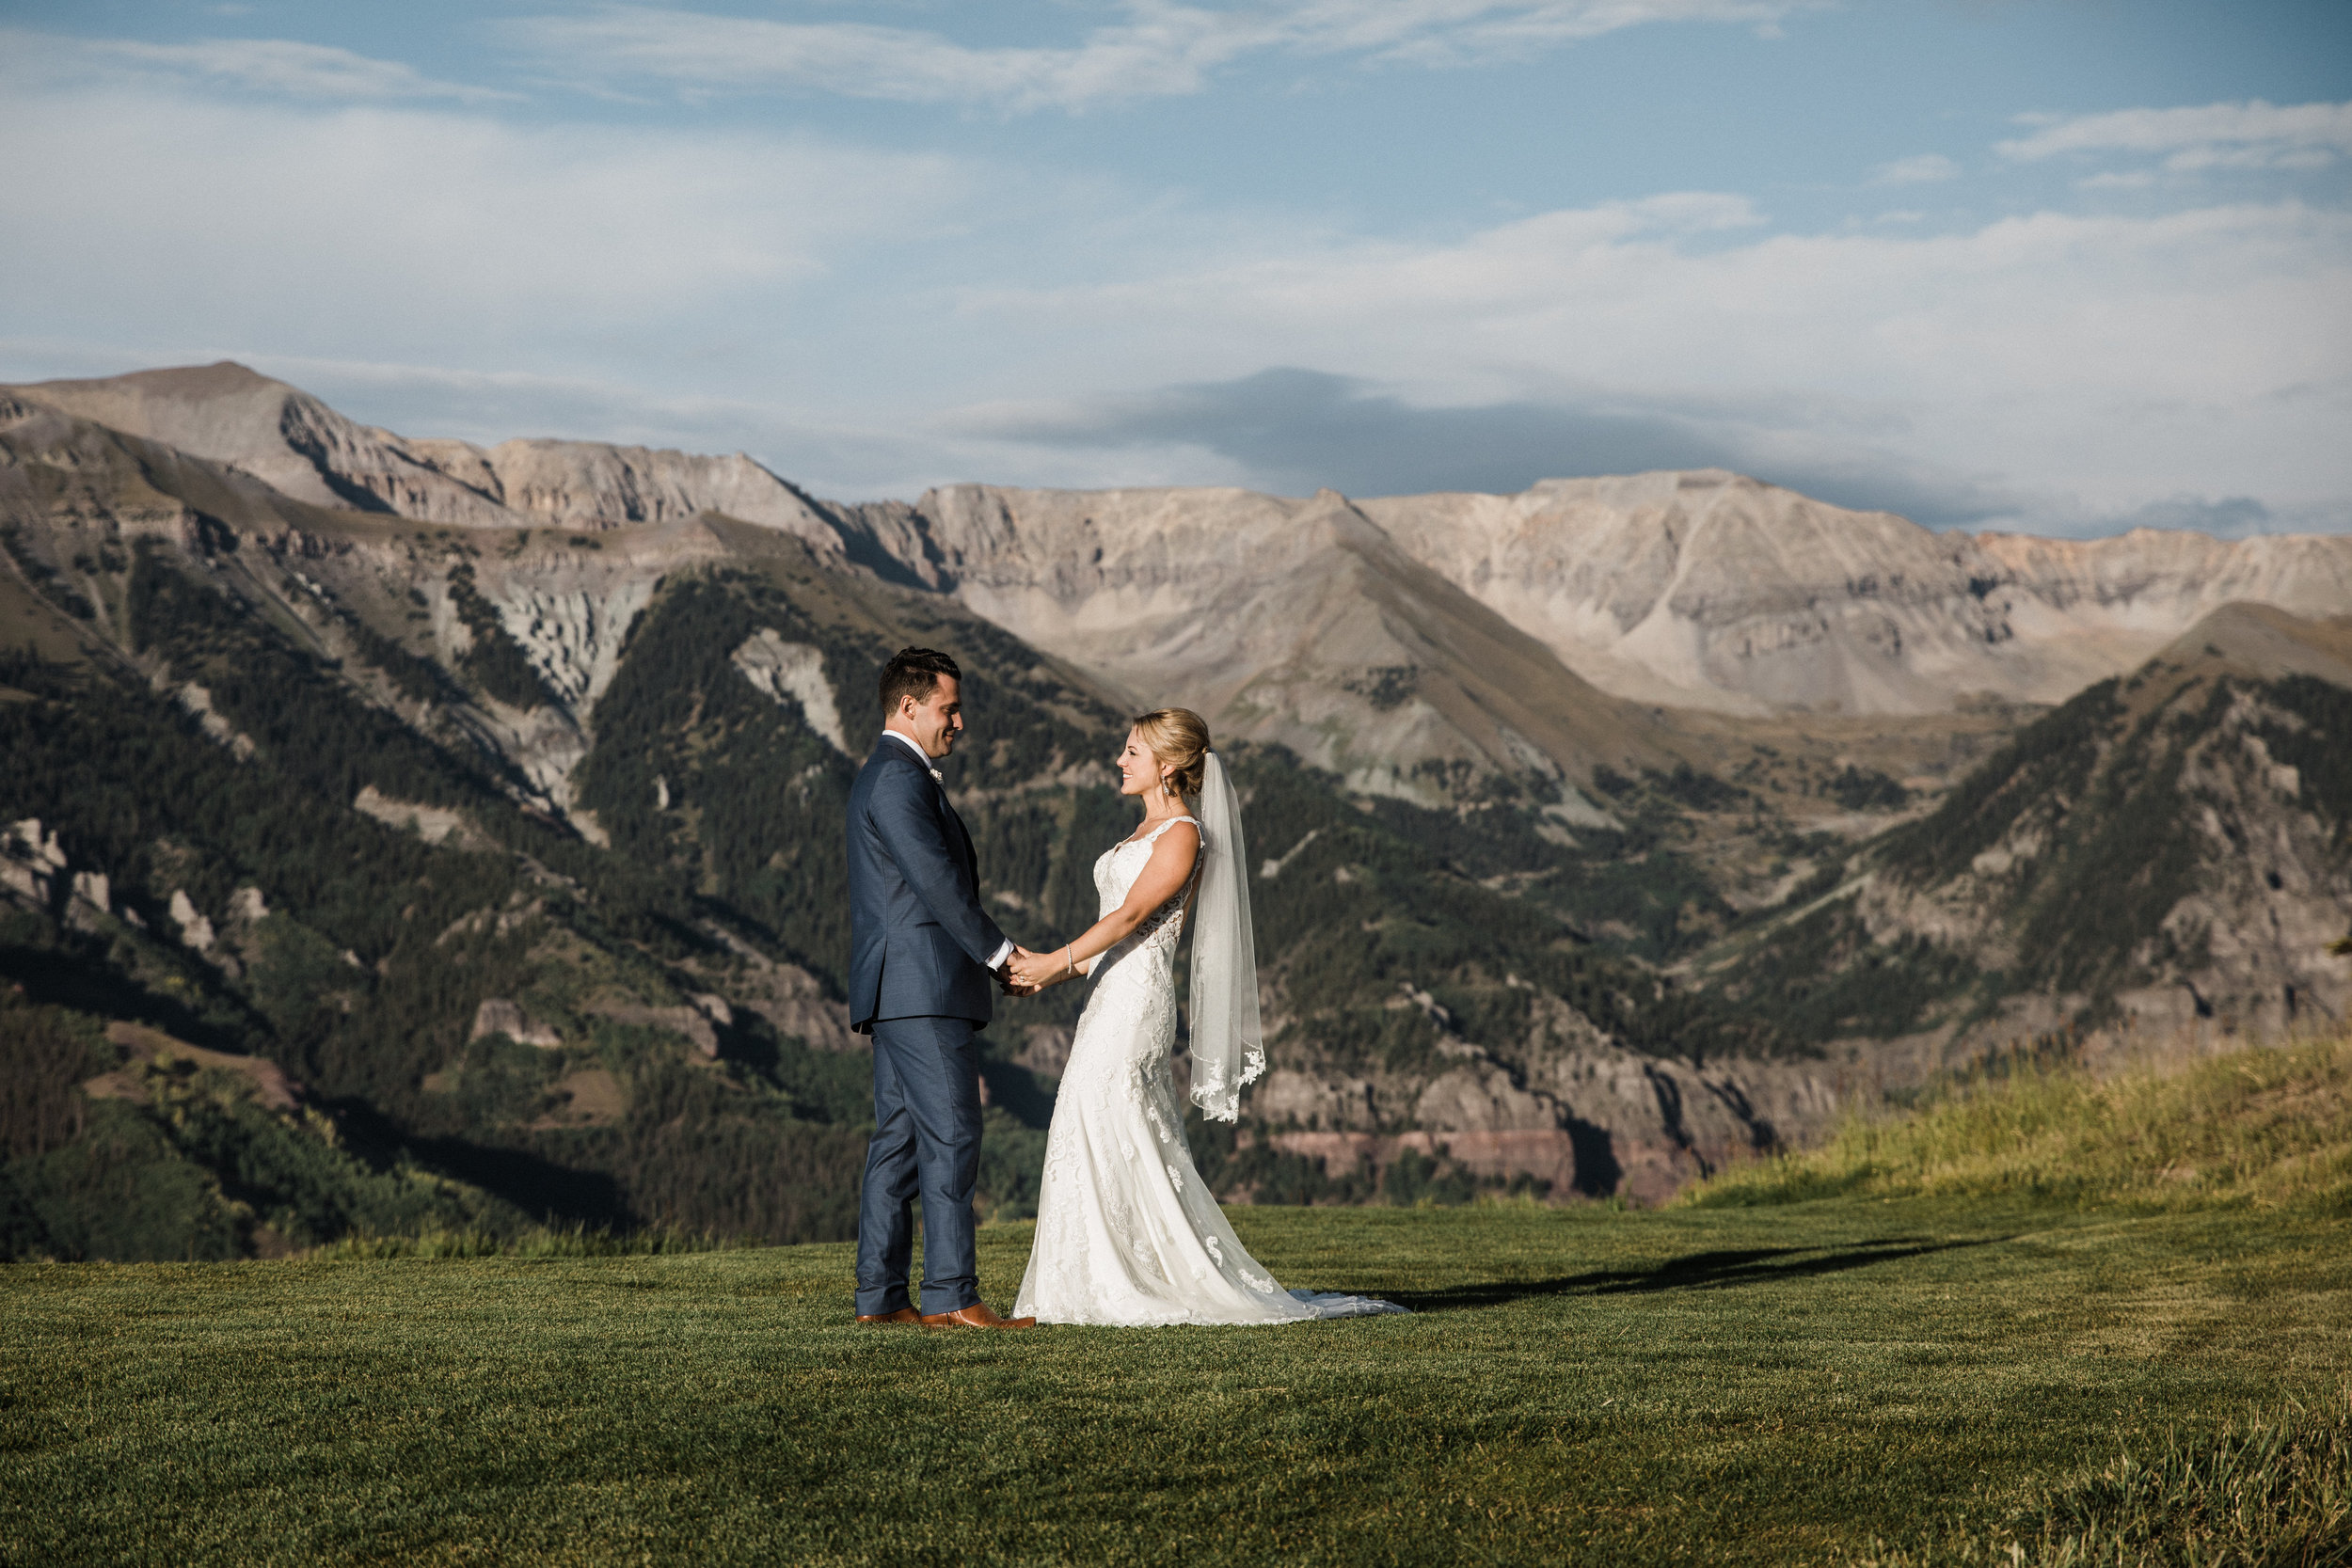 leahandashton-telluride-wedding-photography-0078.jpg